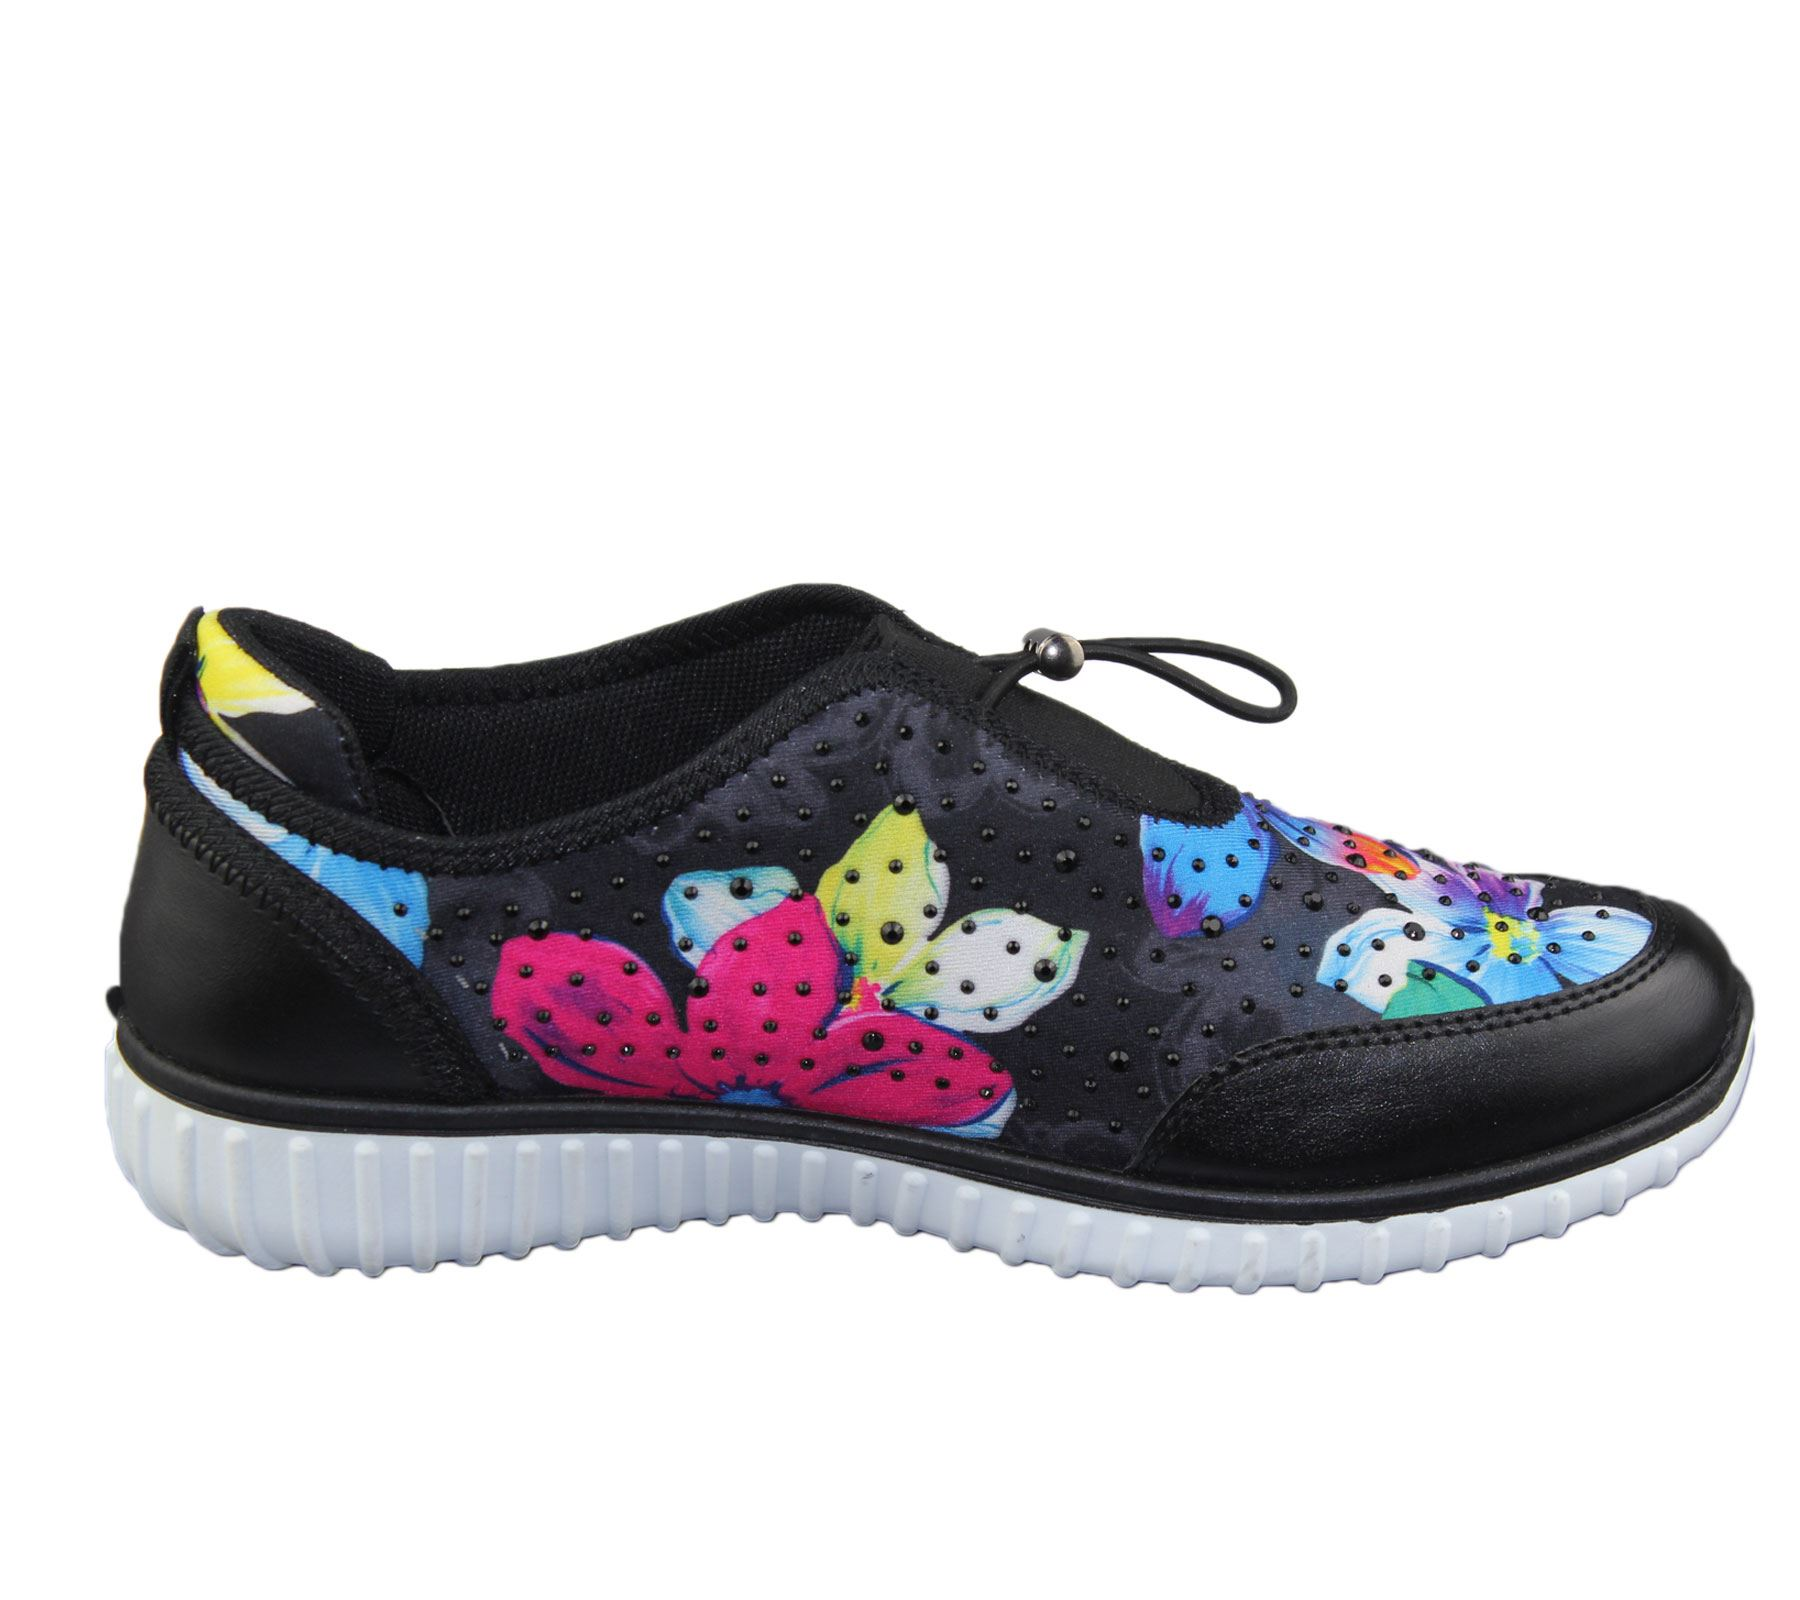 Womens-Trainer-Ladies-Comfort-Walking-Fashion-Summer-Gym-Sport-Flat-Shoes-Size thumbnail 5